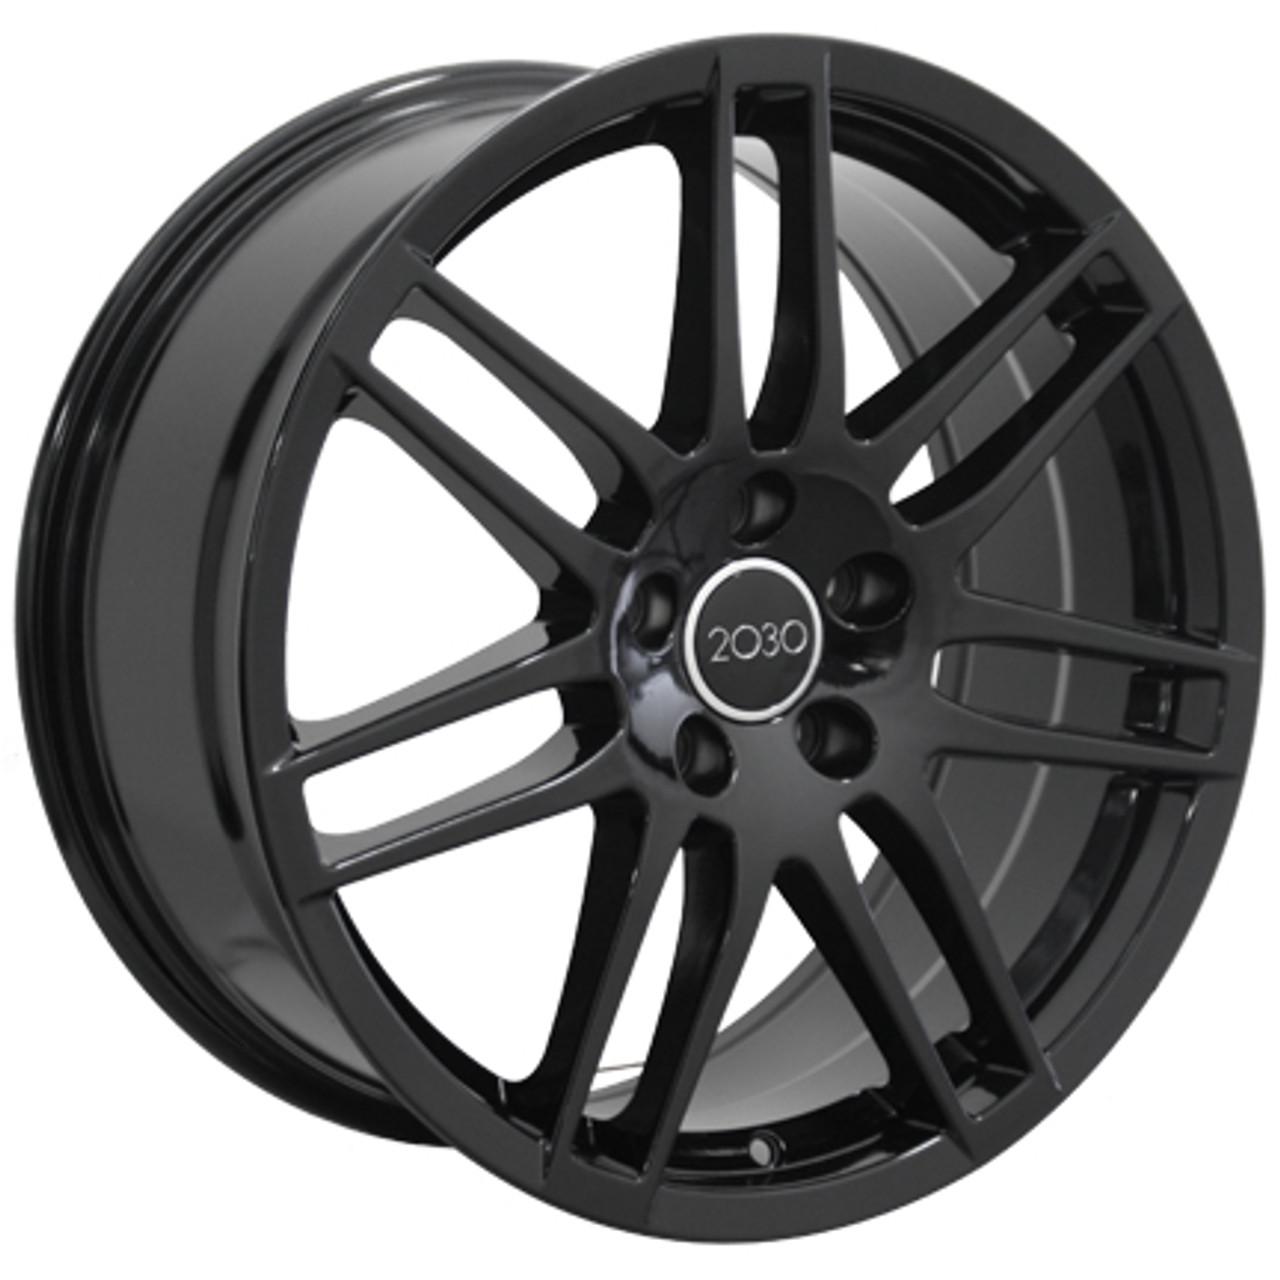 18 Fits Audi Rs4 Wheel Gloss Black Set Of 4 18x8 Rims 42mm Offset Stock Wheel Solutions